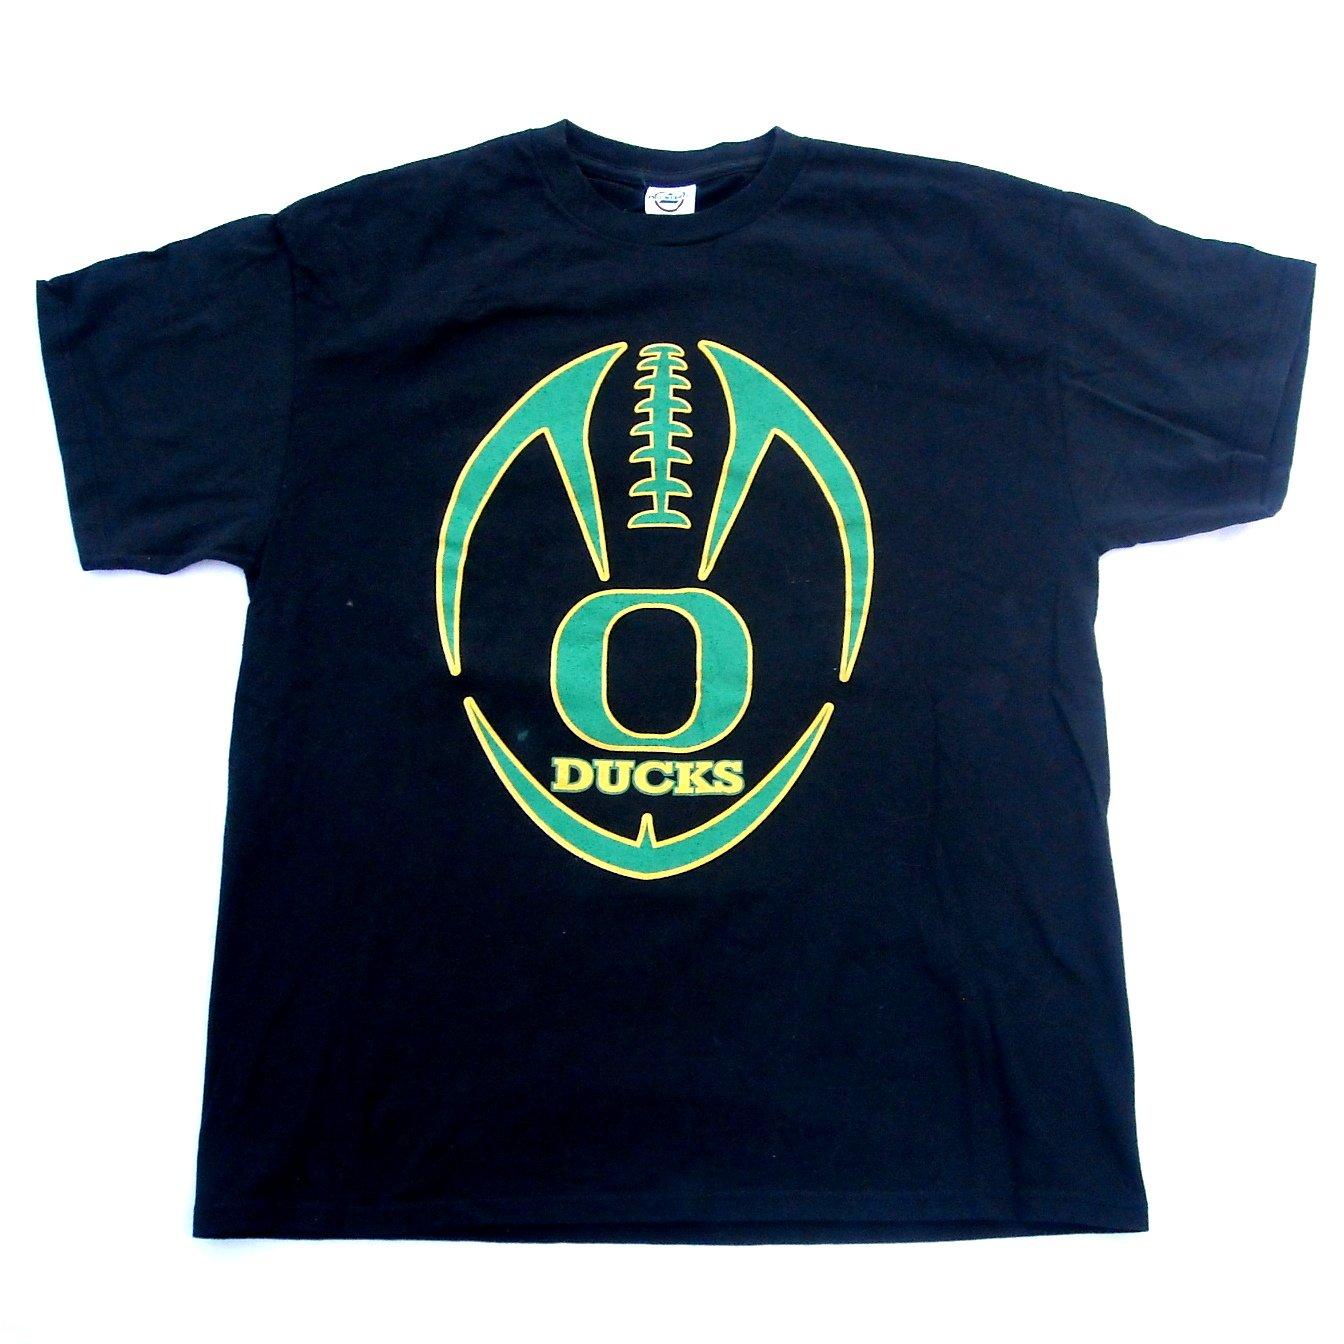 Oregon Ducks Football Delta Pro Weight T Shirt Top Size L